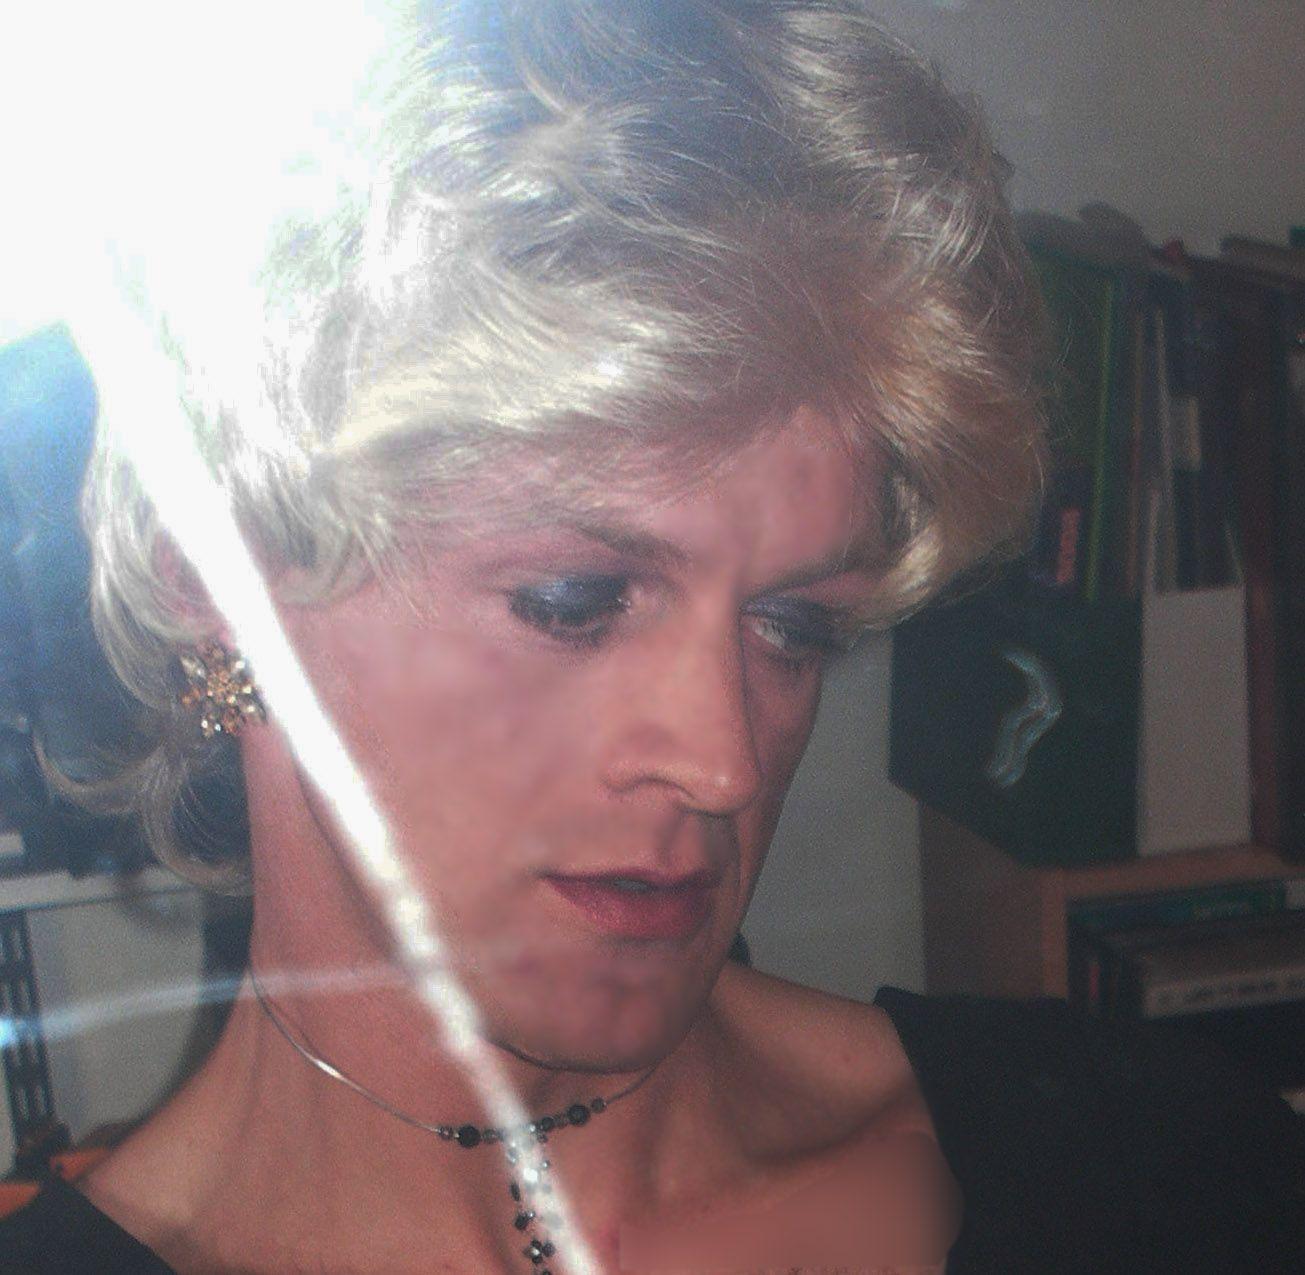 Photos de salopes, blondes, babes, bimbos - Blondesalopenet